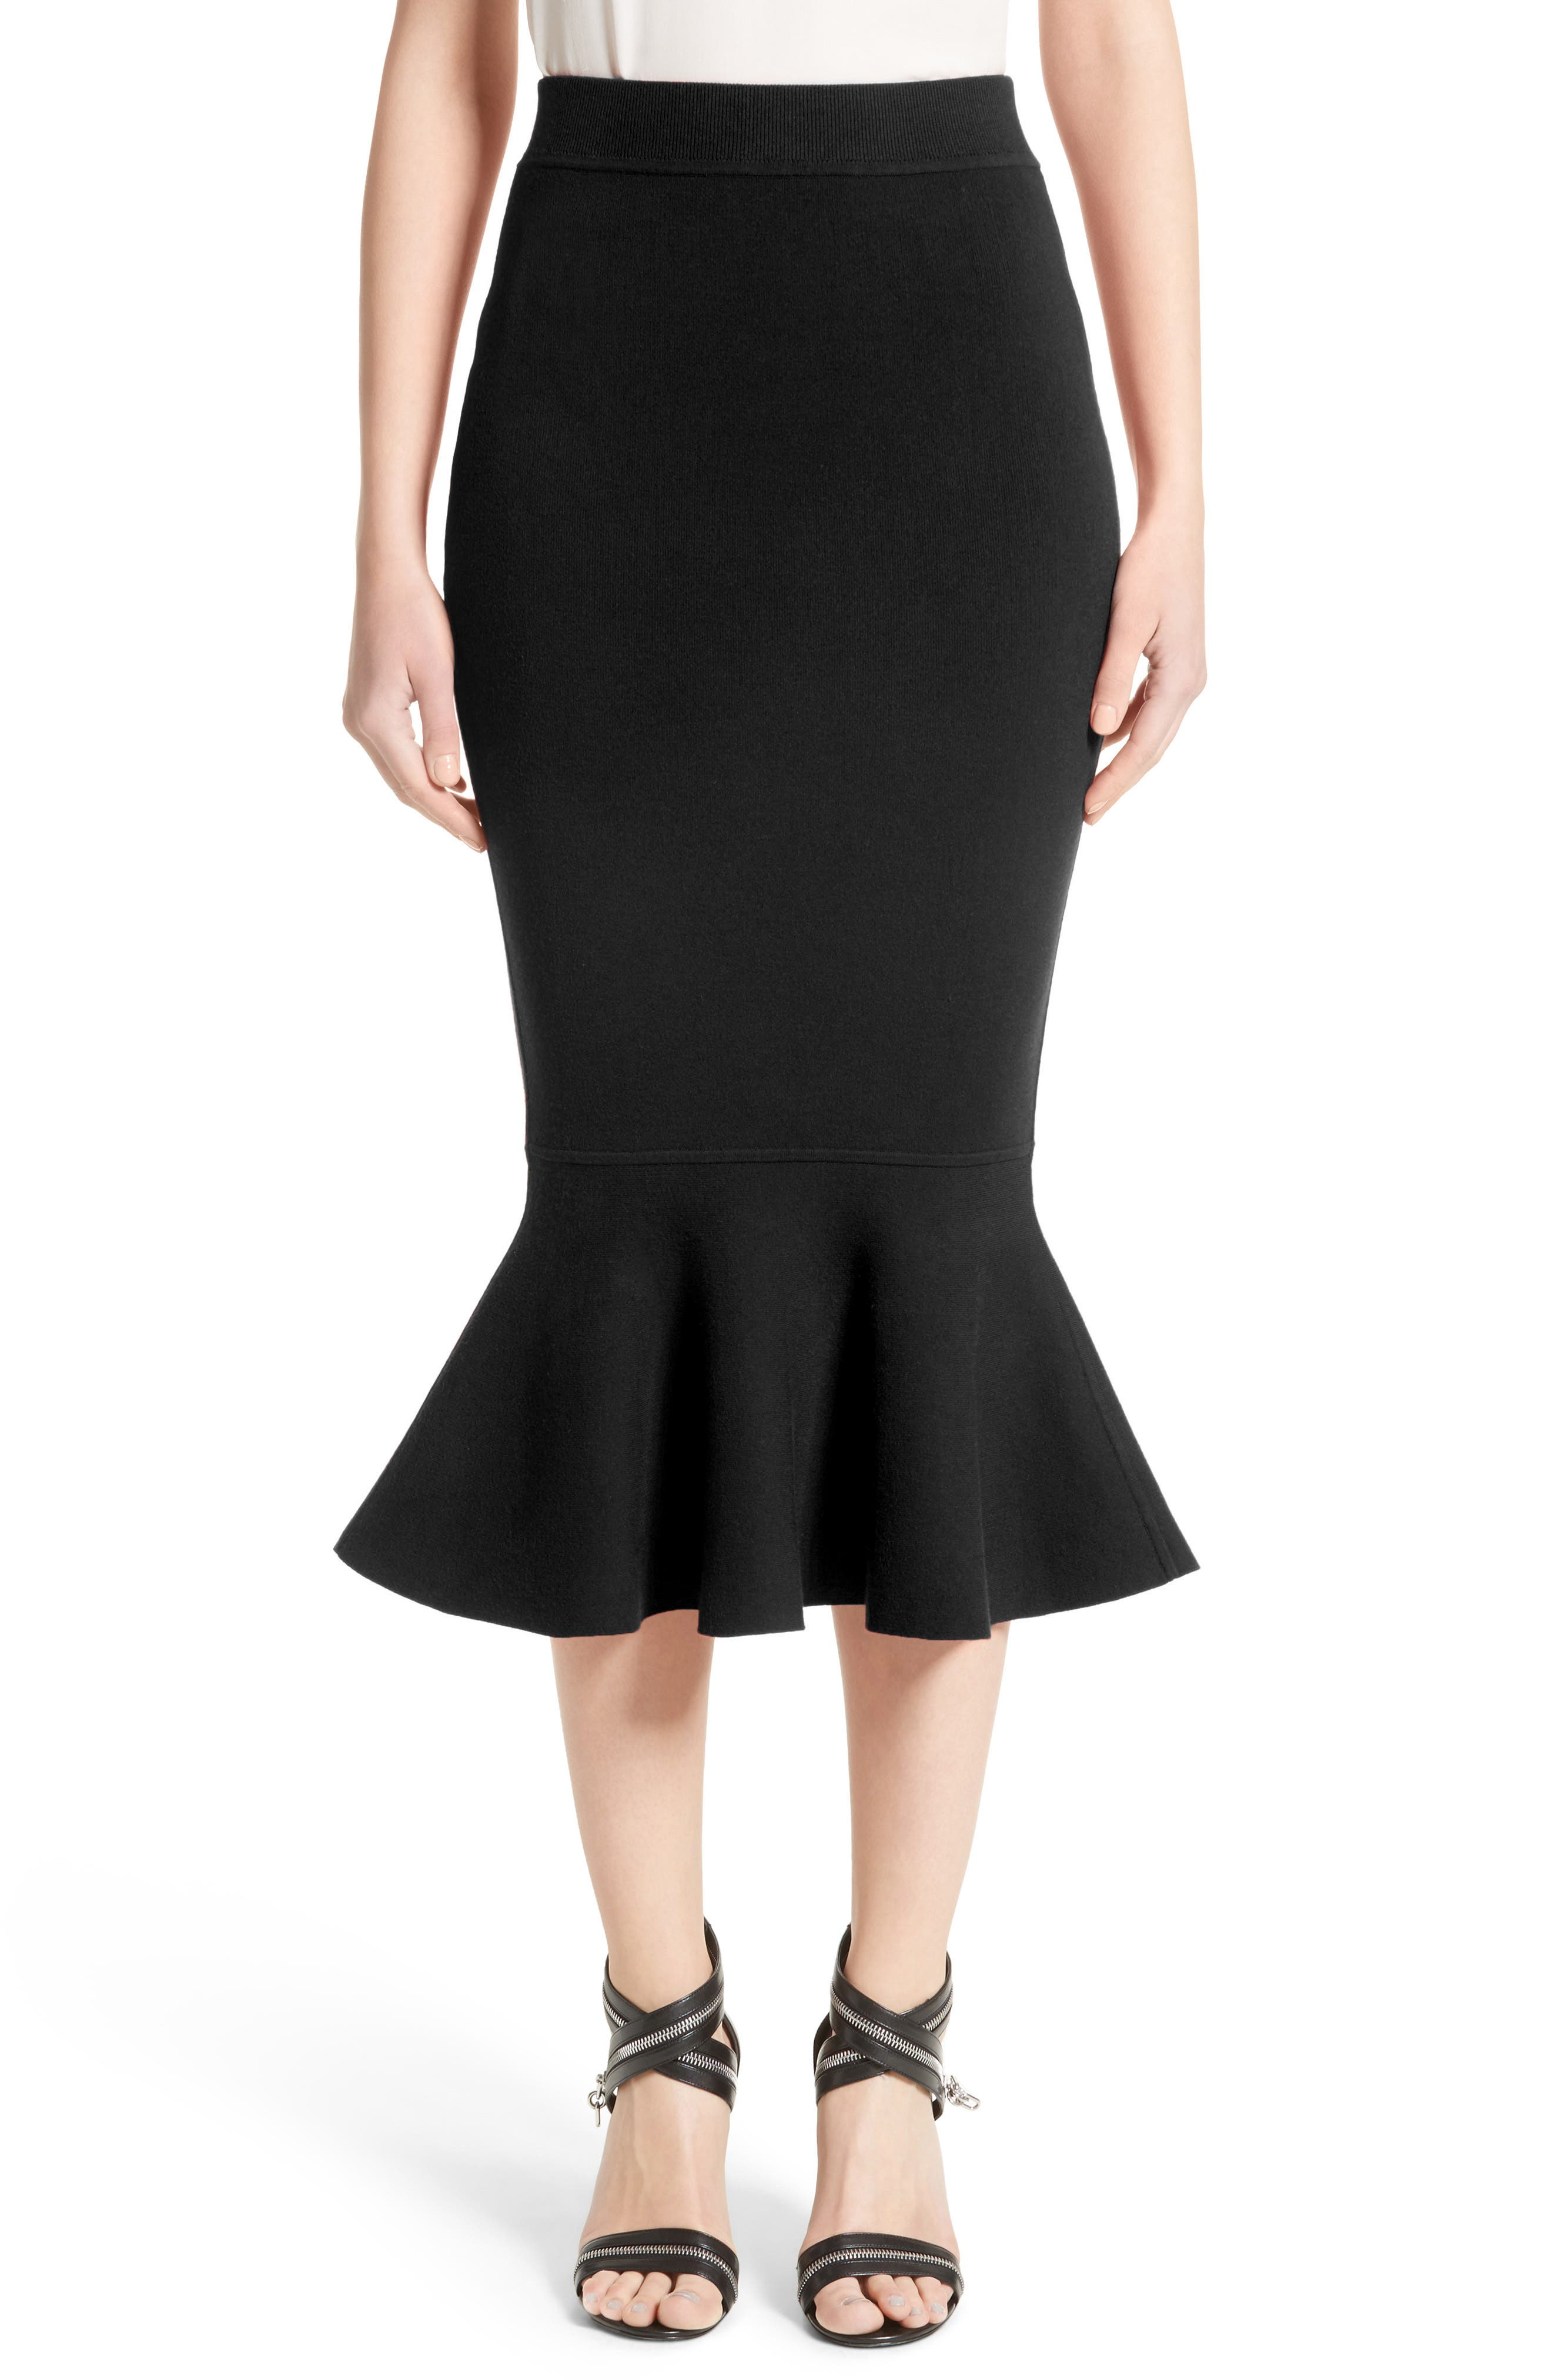 Alternate Image 1 Selected - Michael Kors Stretch Knit Flounce Skirt